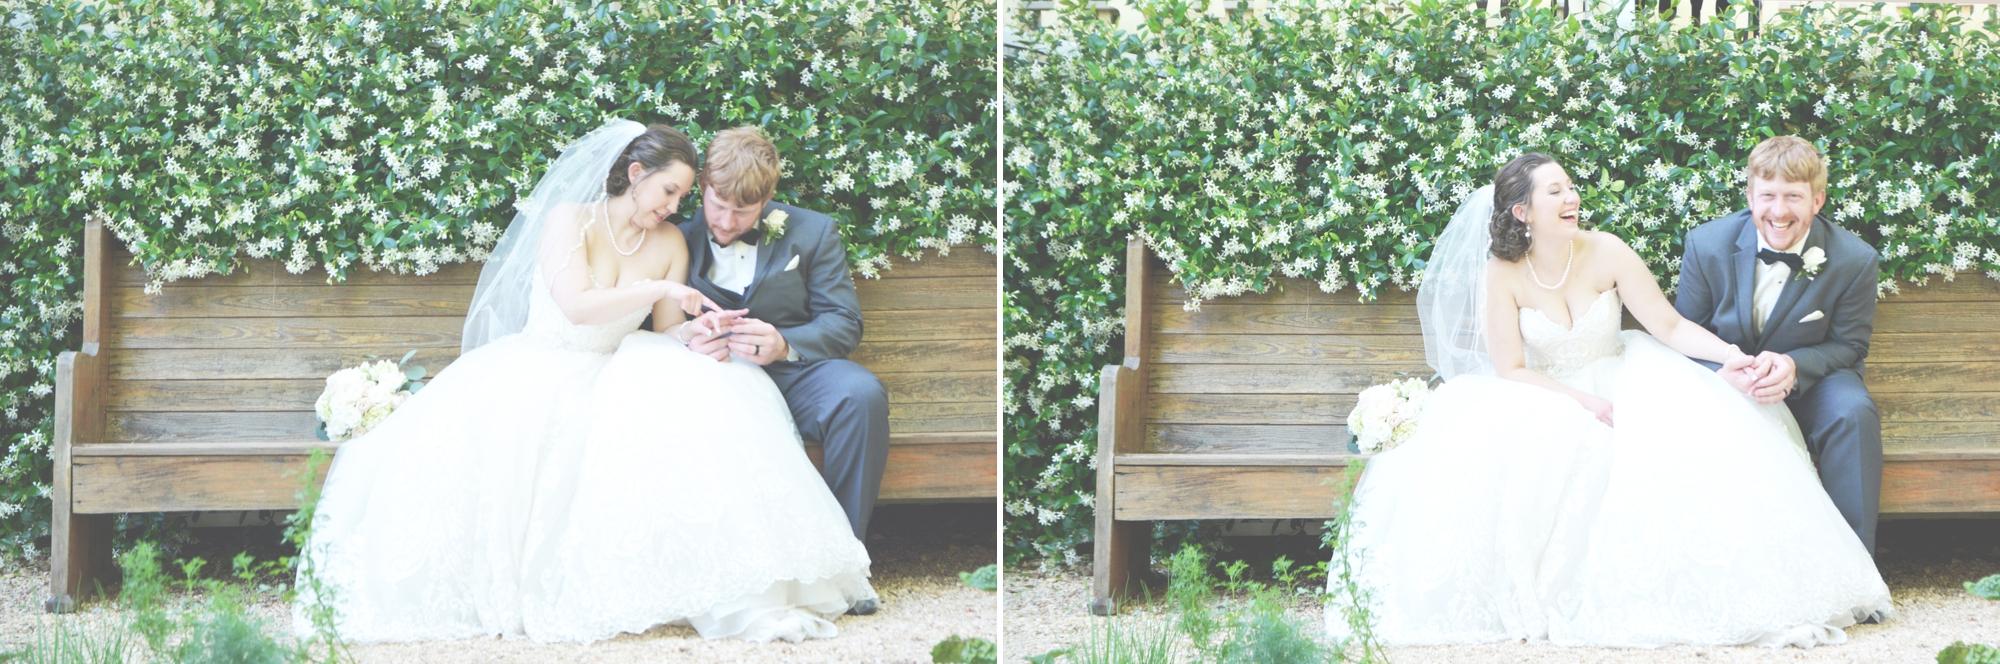 The Brady Inn Wedding Photography - Six Hearts Photography014